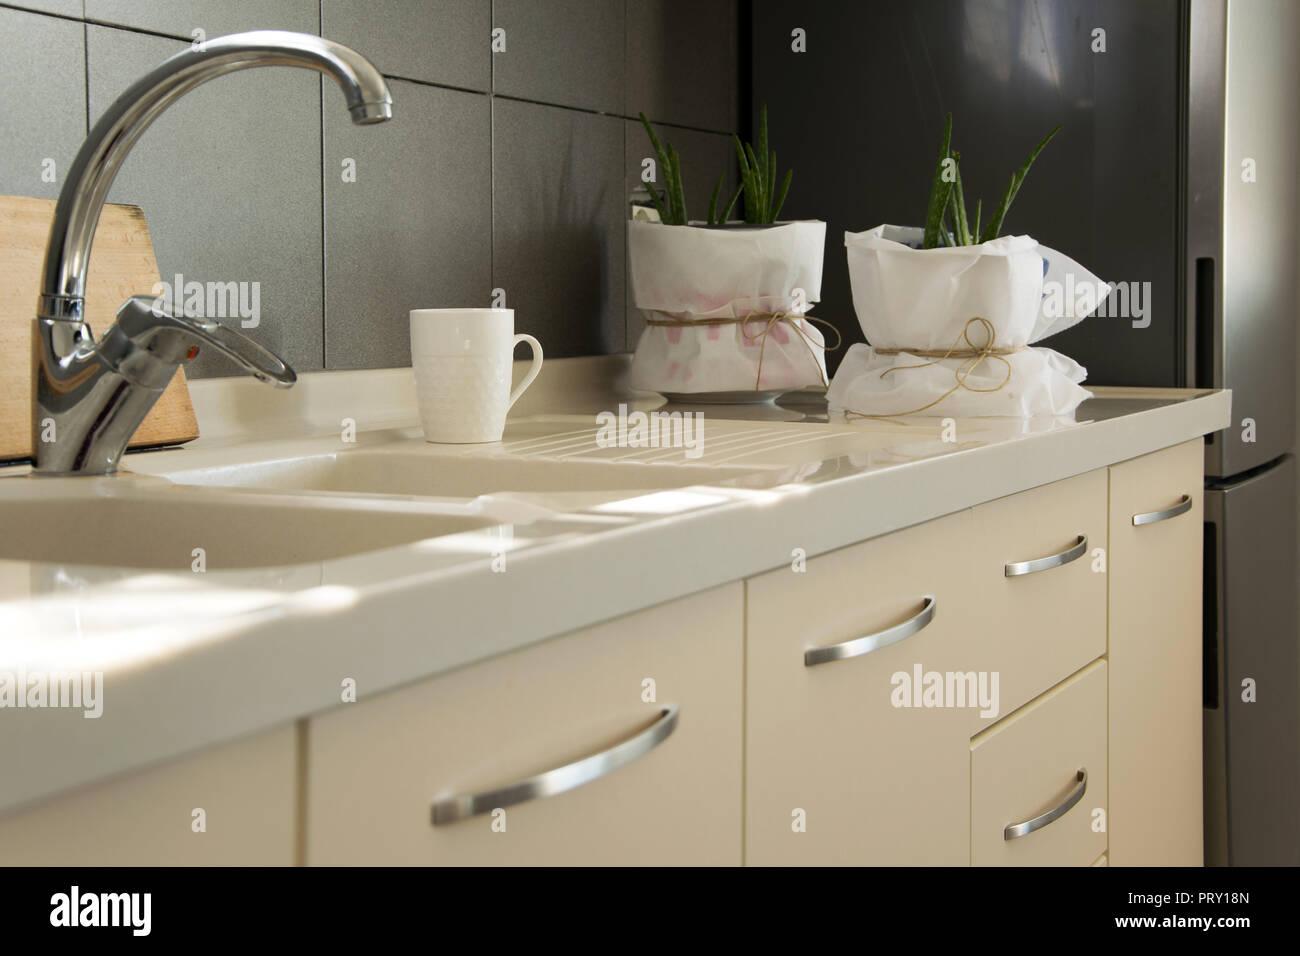 Cucina moderna con interni, scandinavo in stile ...